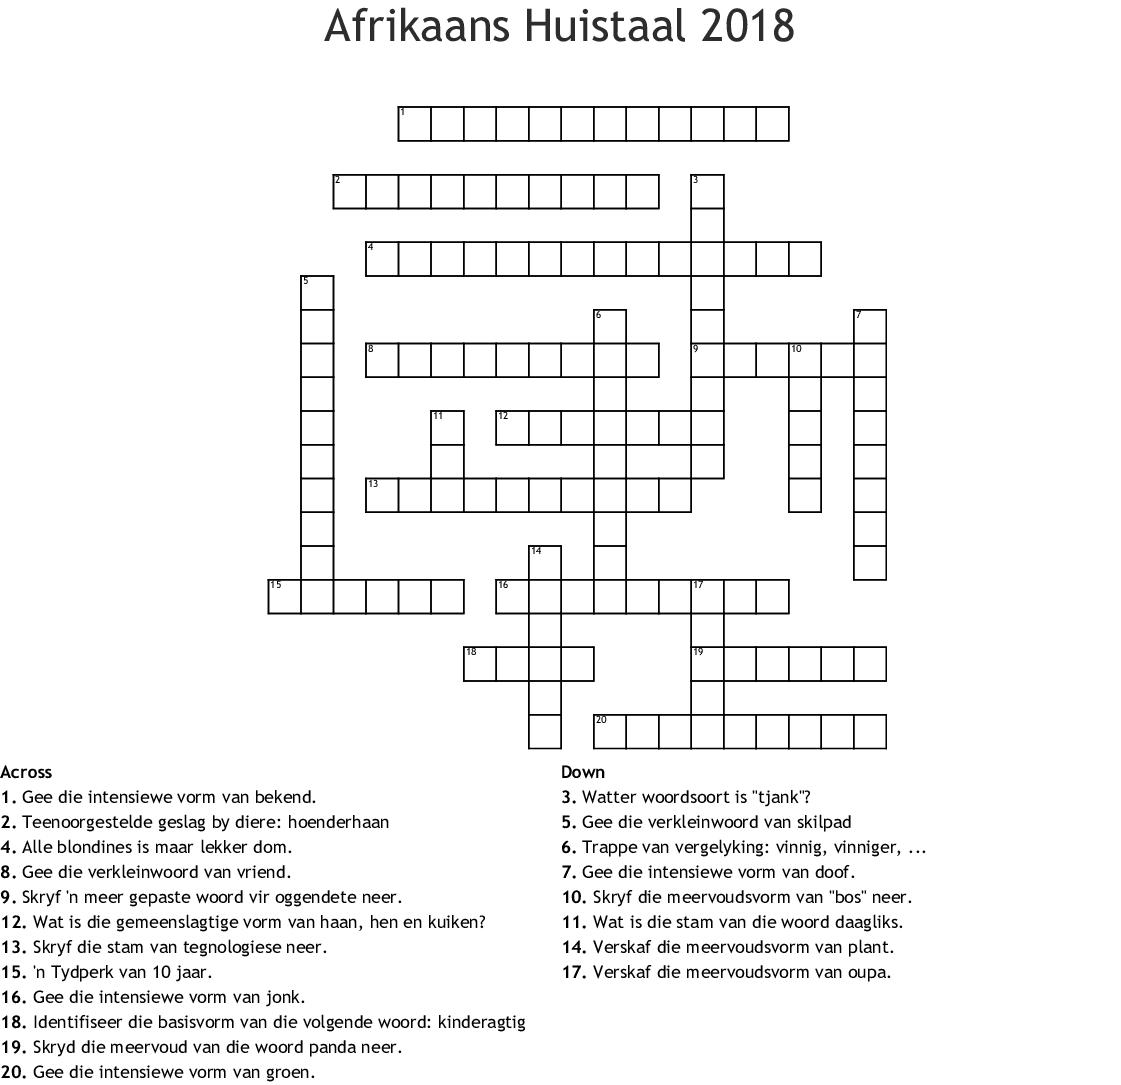 Sosiale Struktuur In Antieke Egipte Crossword